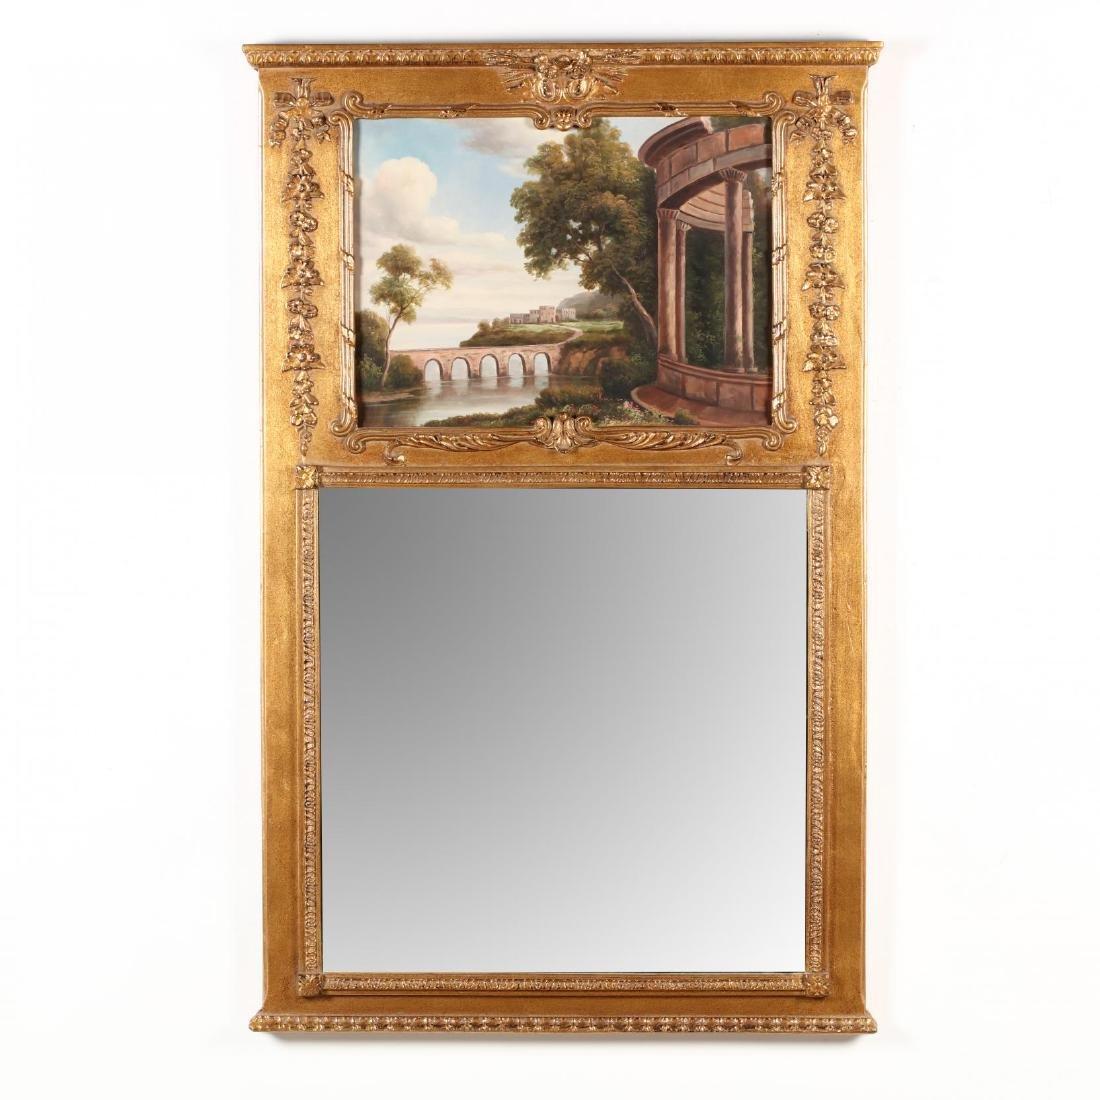 A Contemporary Decorative Trumeau